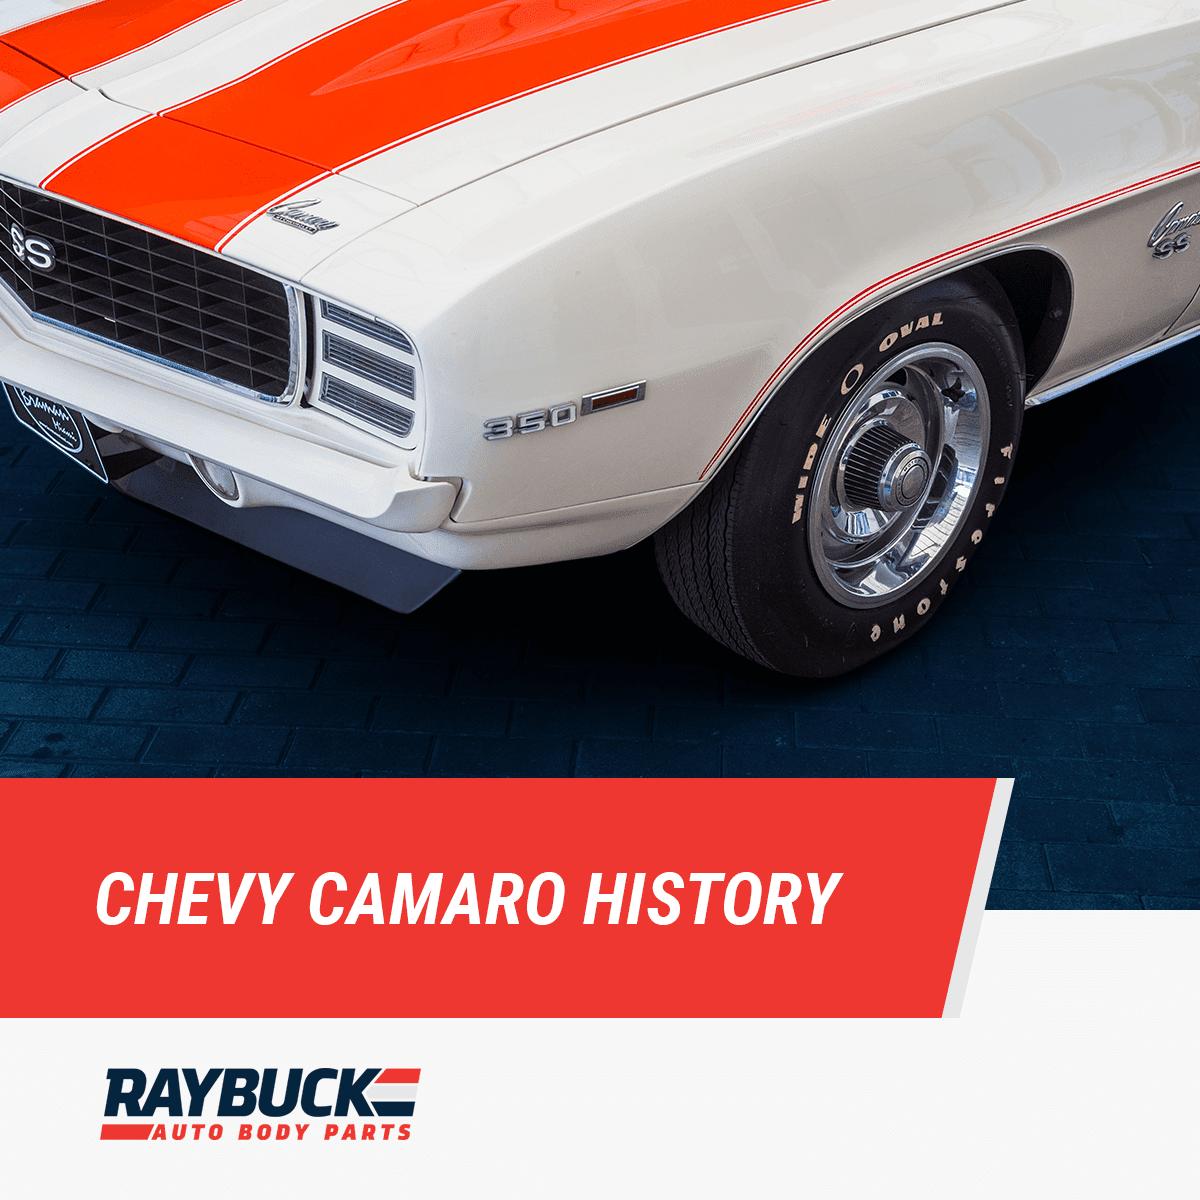 Chevy Camaro History and Evolution